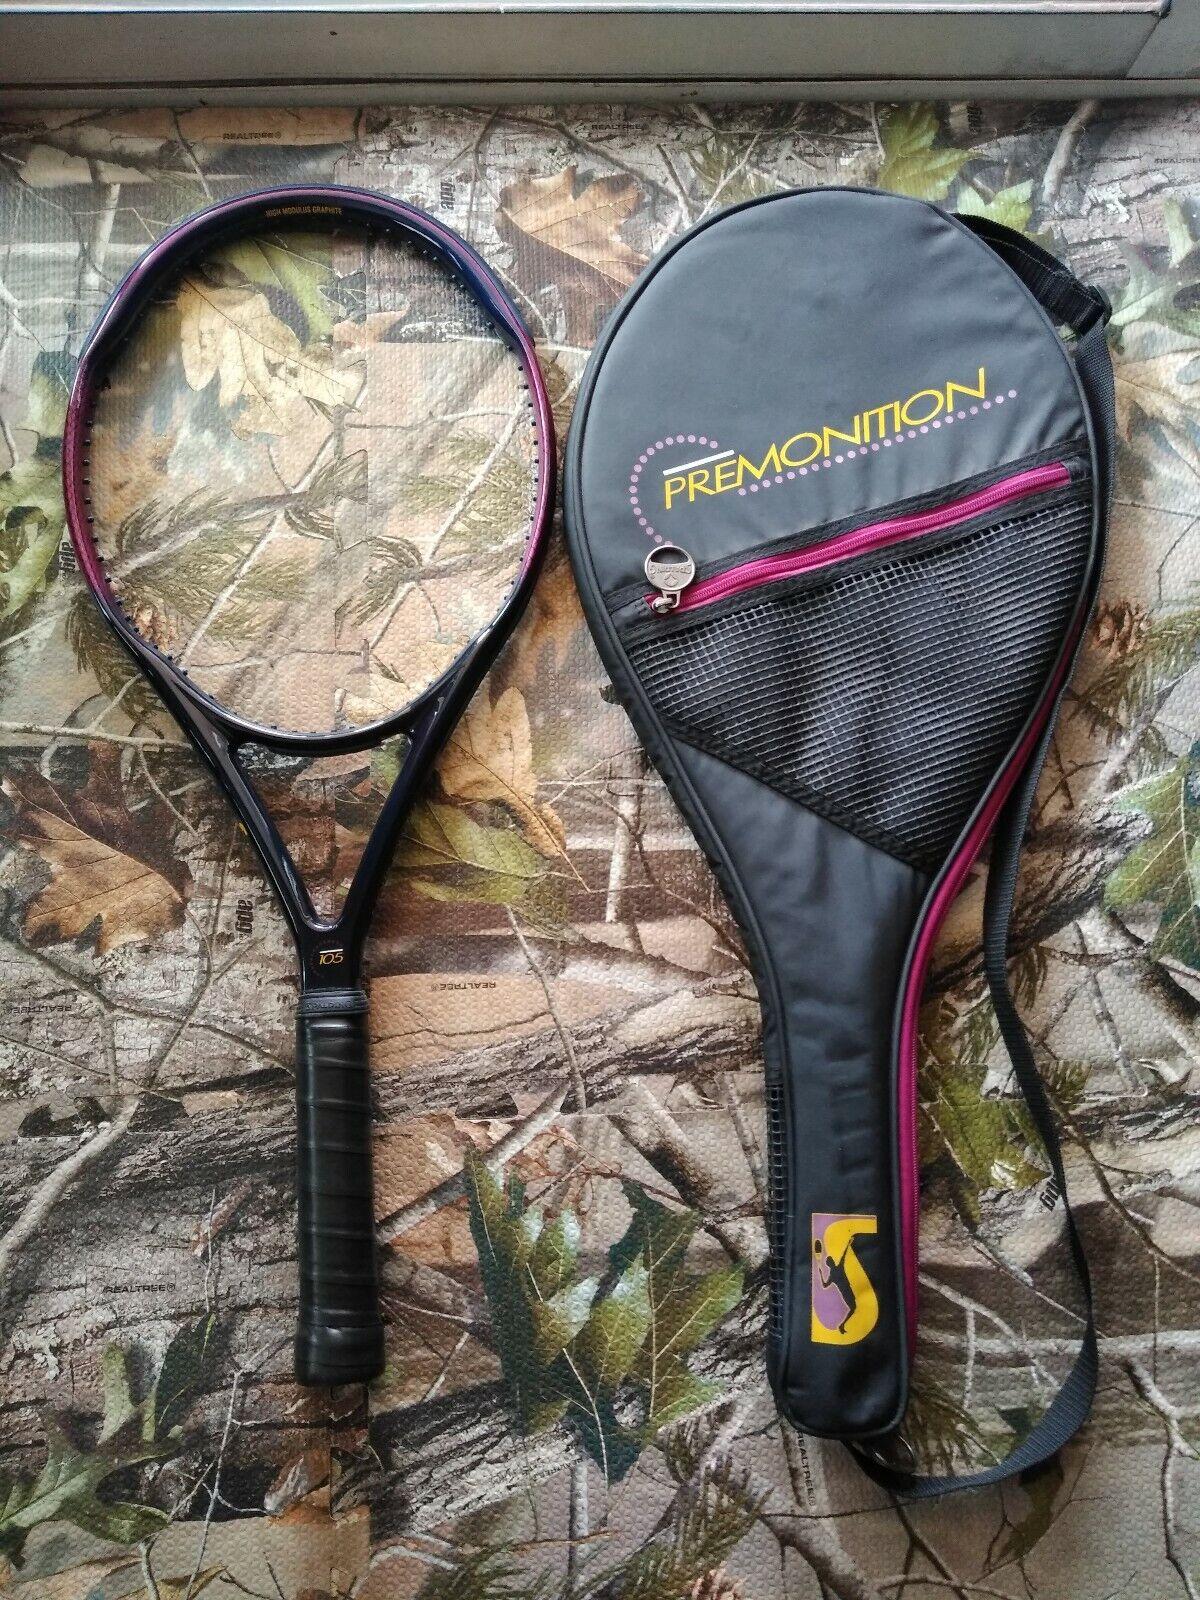 Spalding Premonition OS 105 head 4 5 8 grip Vintage Tennis Racquet with case